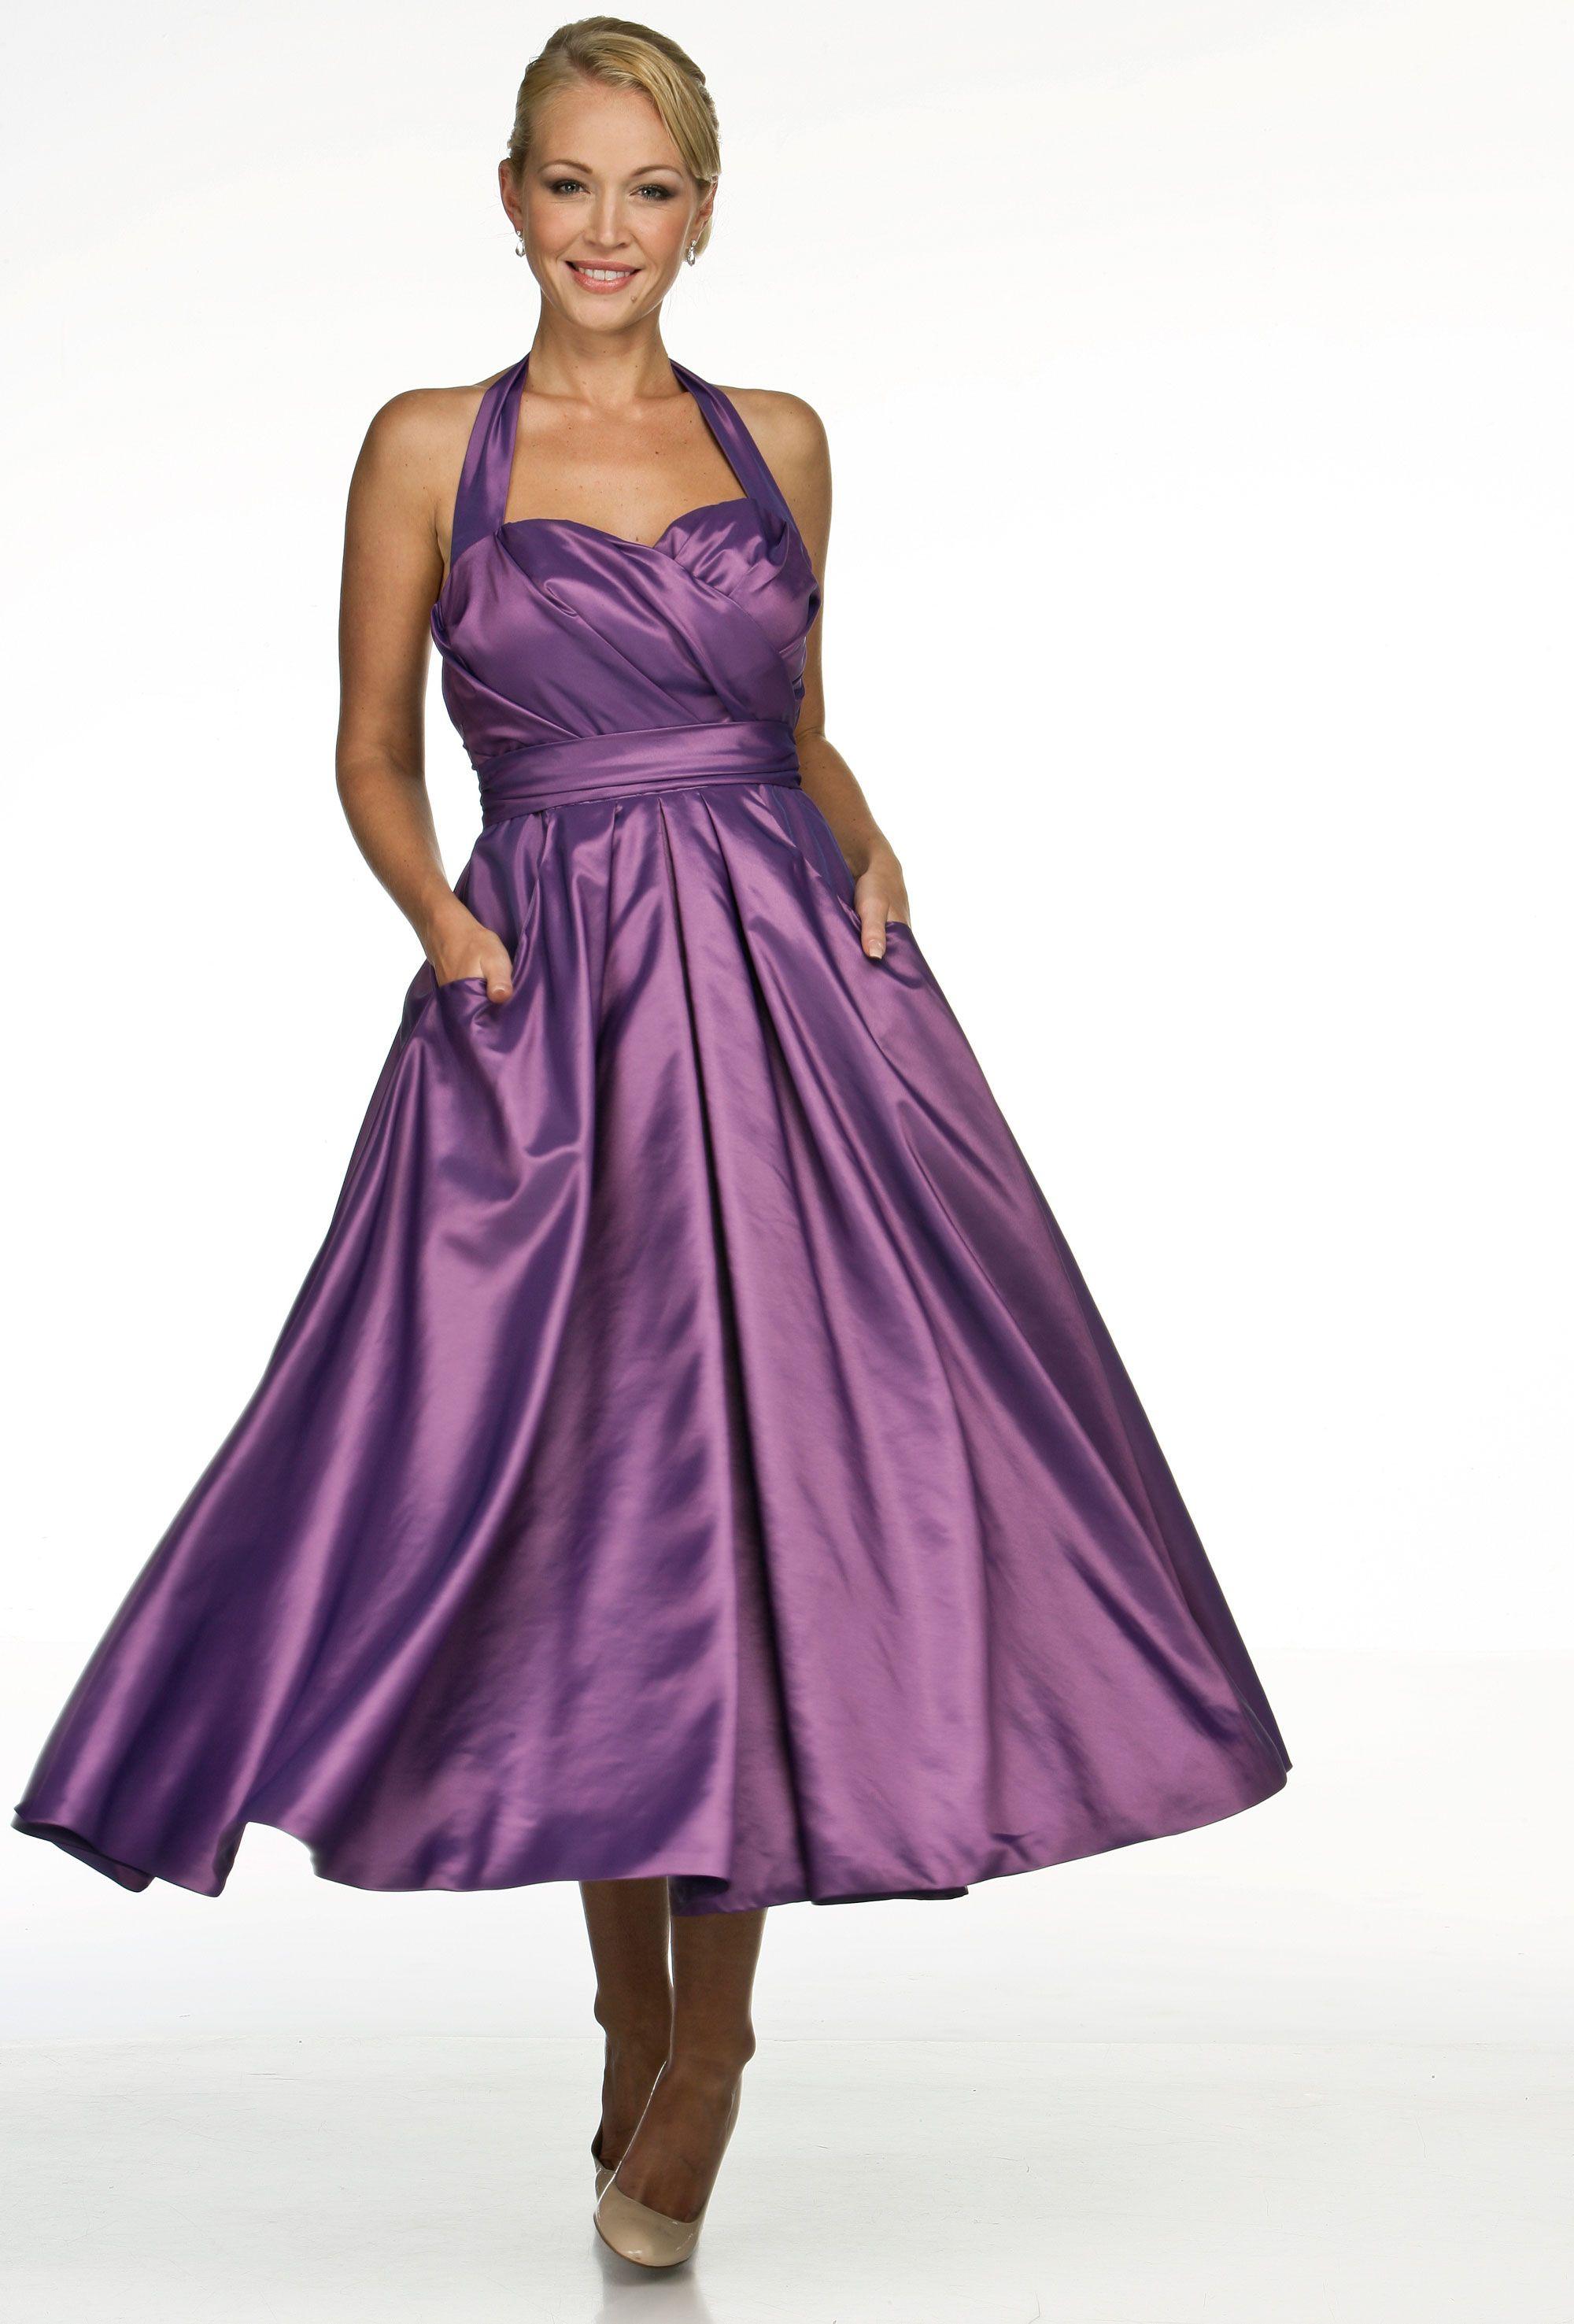 Phoebe | Joyce Young | Wedding dresses | Pinterest